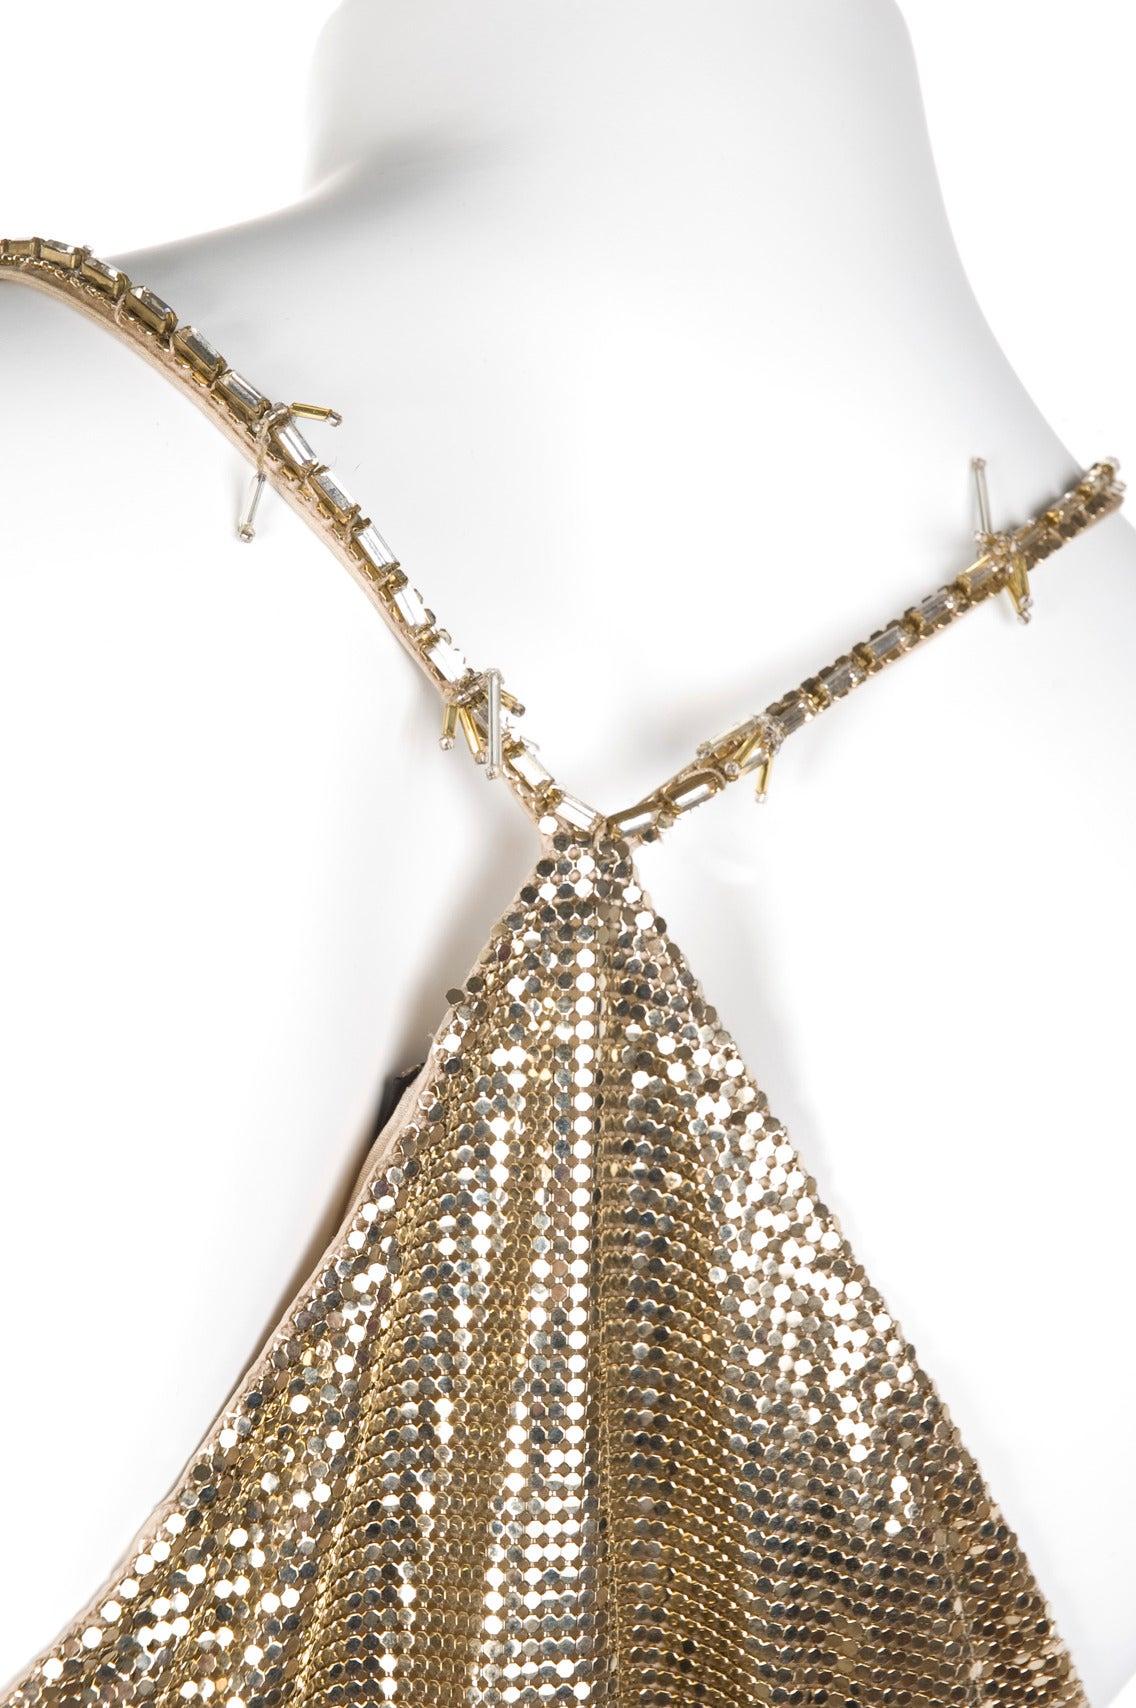 1982 Gianni Versace Couture Metal Mesh Oroton Top and Skirt 6